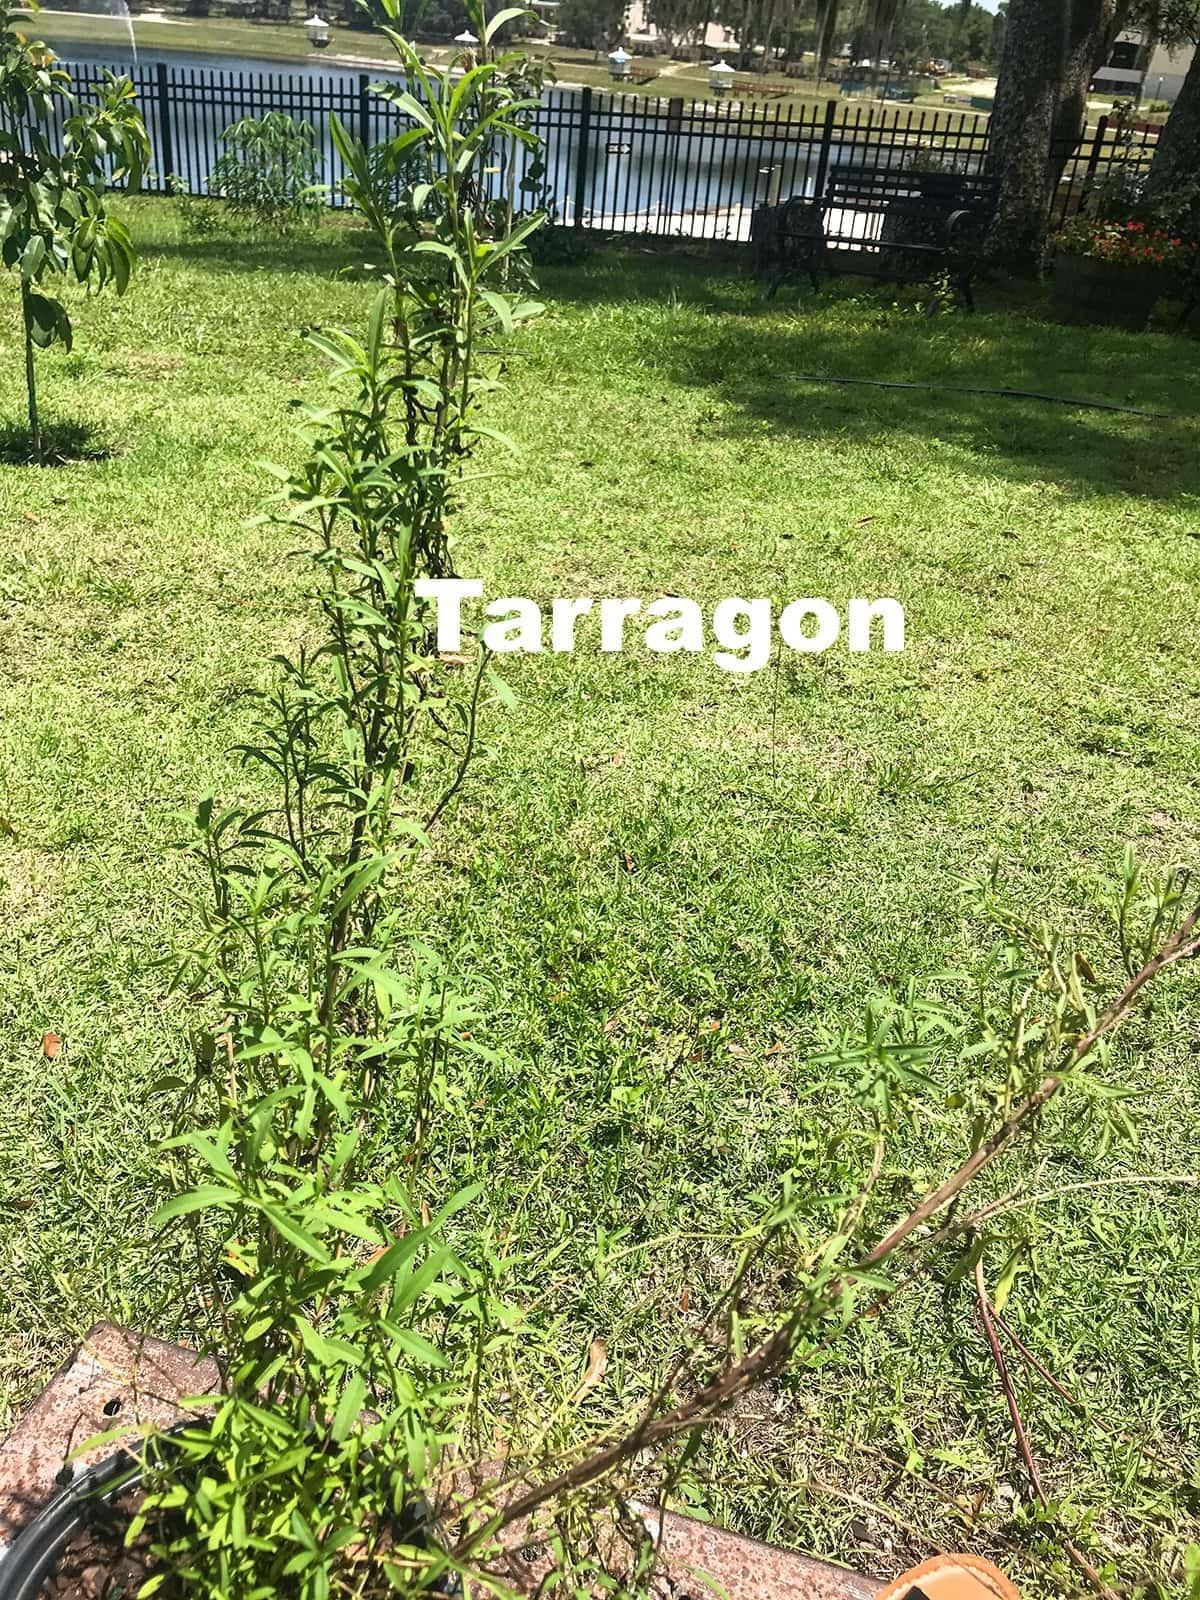 tarragon plant in my garden in a pot